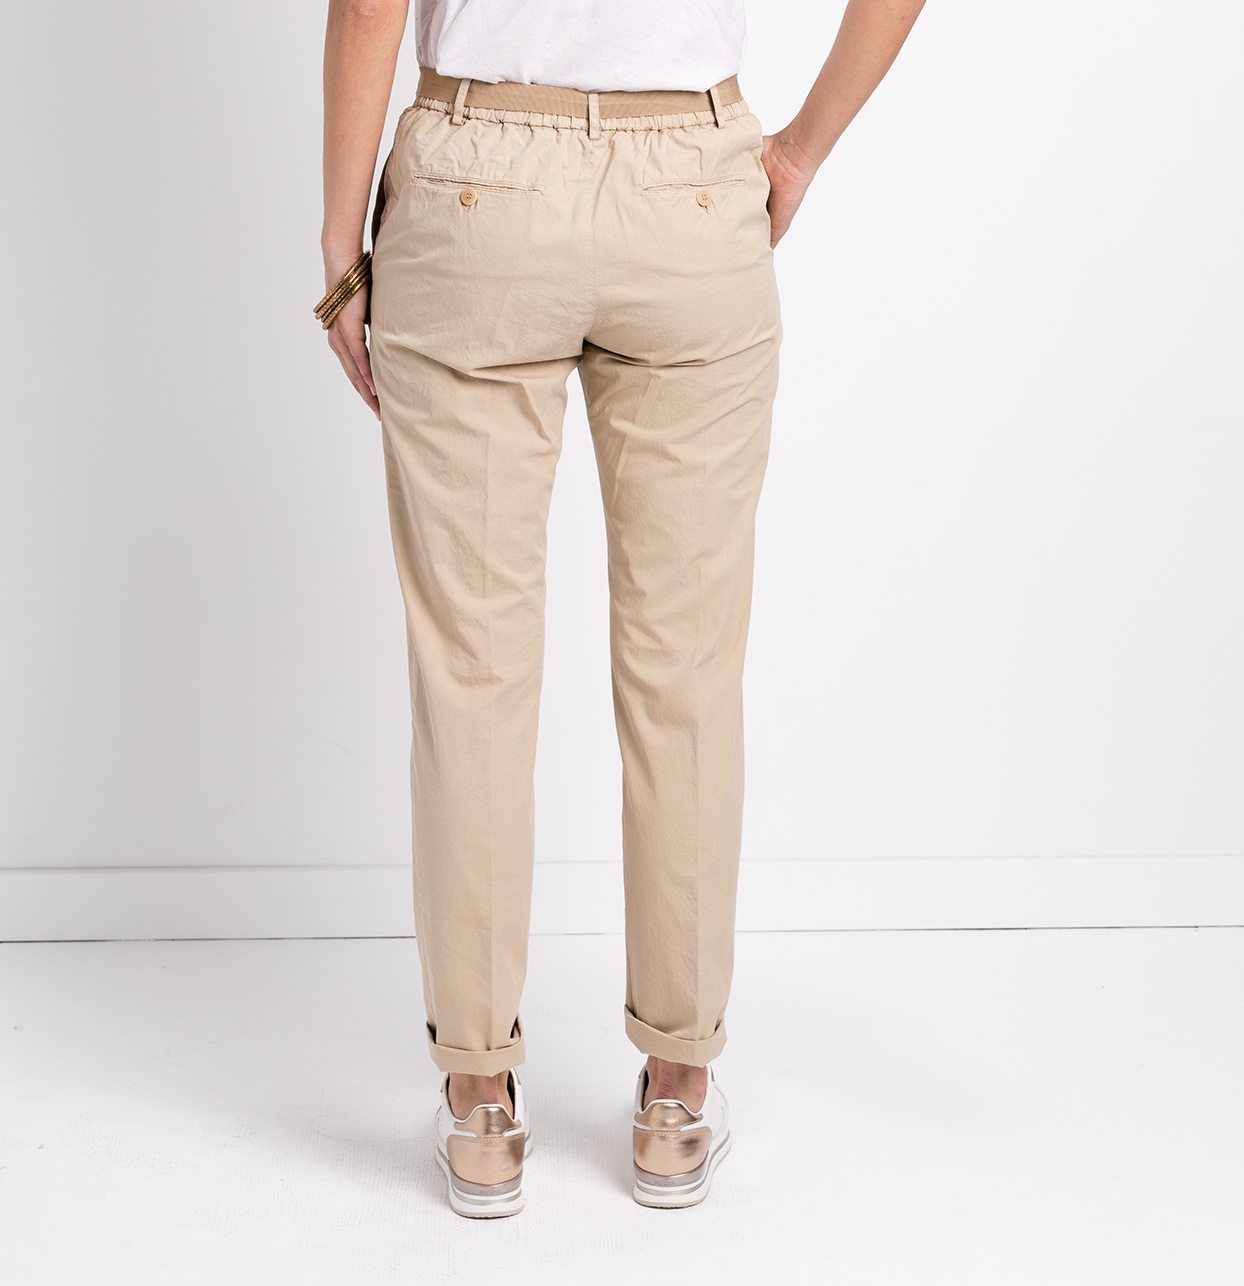 Pantalón soft woman modelo PAPILLON color beige. - Ítem2